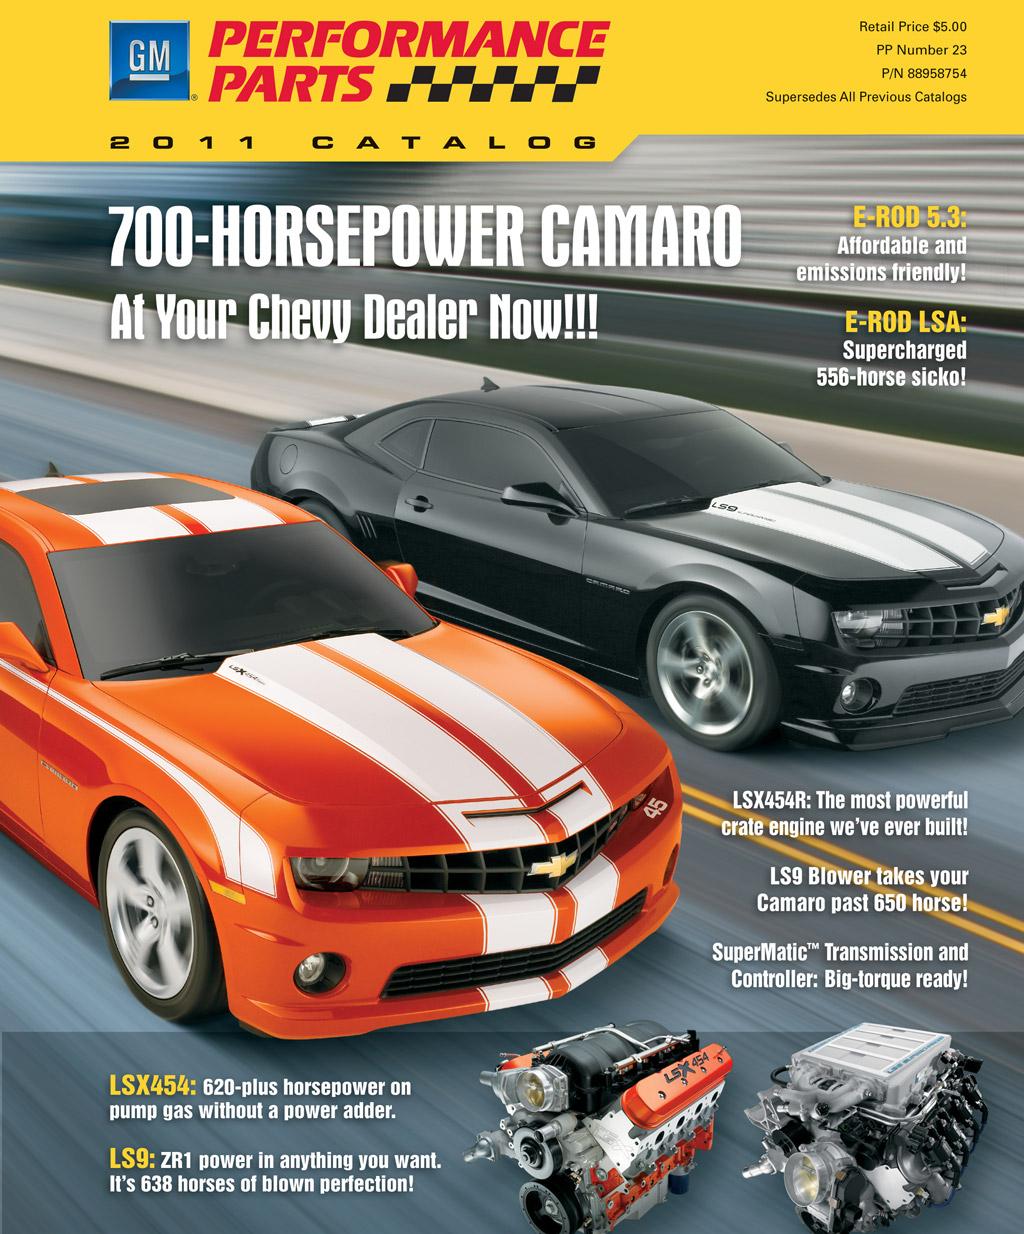 GM Performance Parts Updates 2011 Catalog, Lists 700-HP